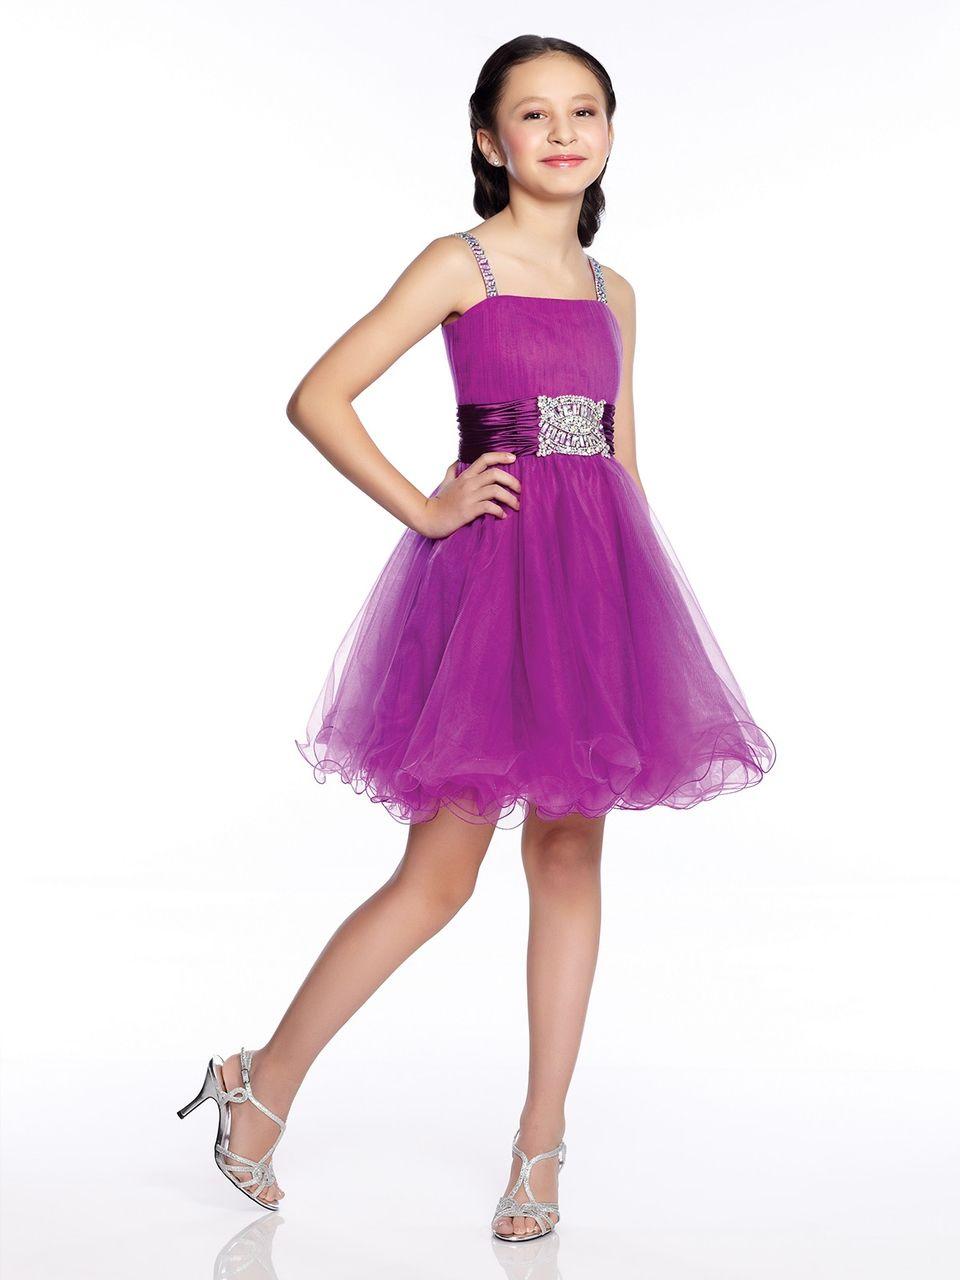 Lexie Girls Cocktail Dress Tw21546 Junior Party Dresses Dresses For Tweens Girly Dresses [ 1280 x 960 Pixel ]